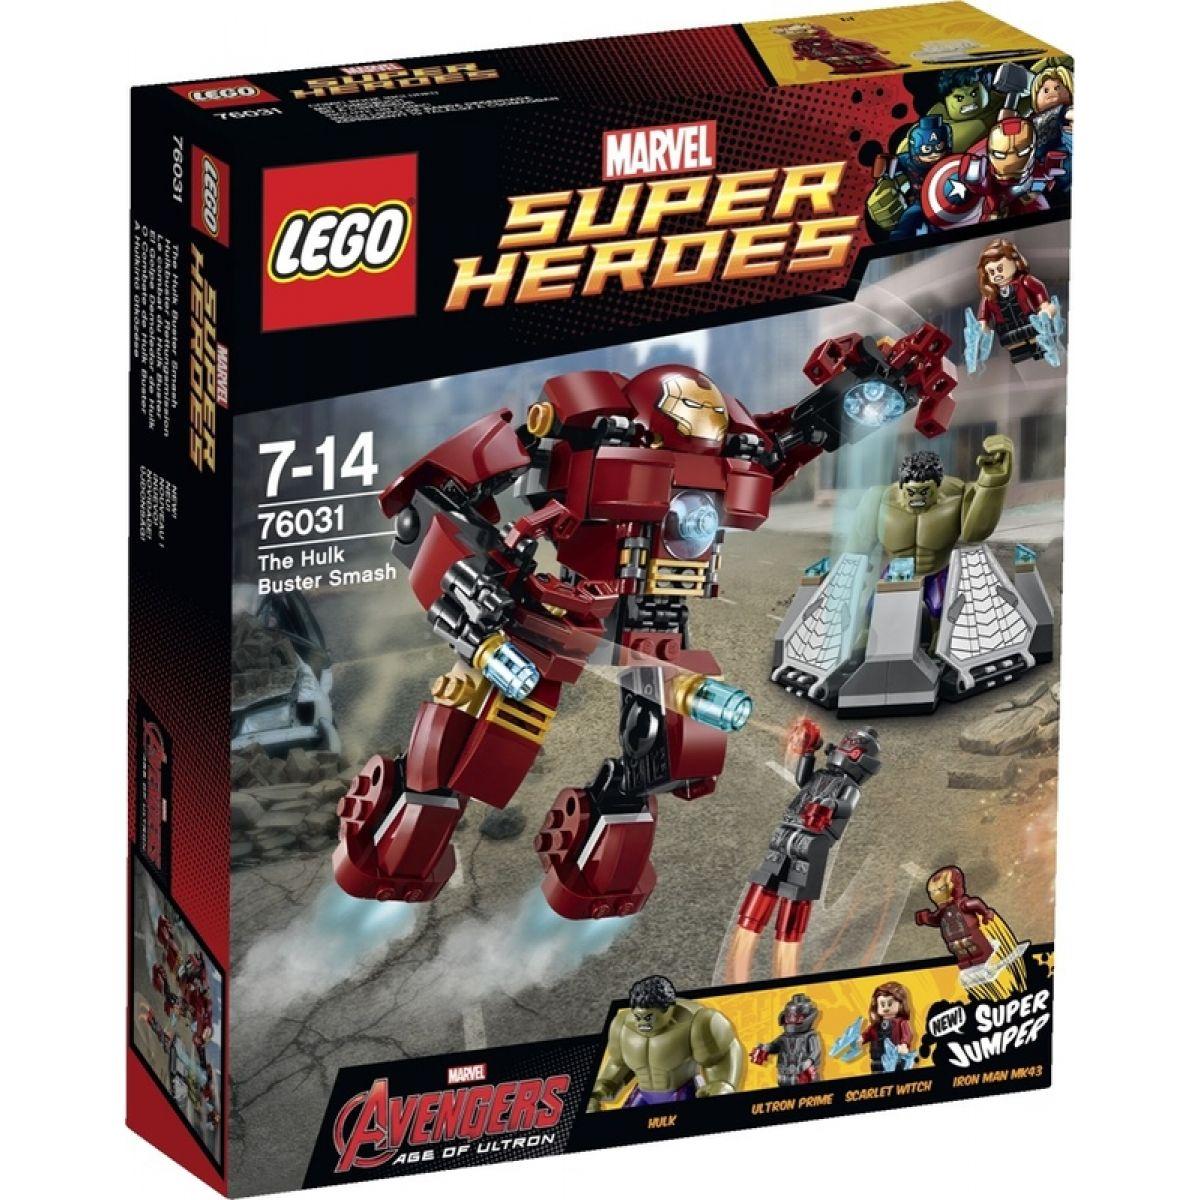 LEGO Super Heroes 76031 Avengers